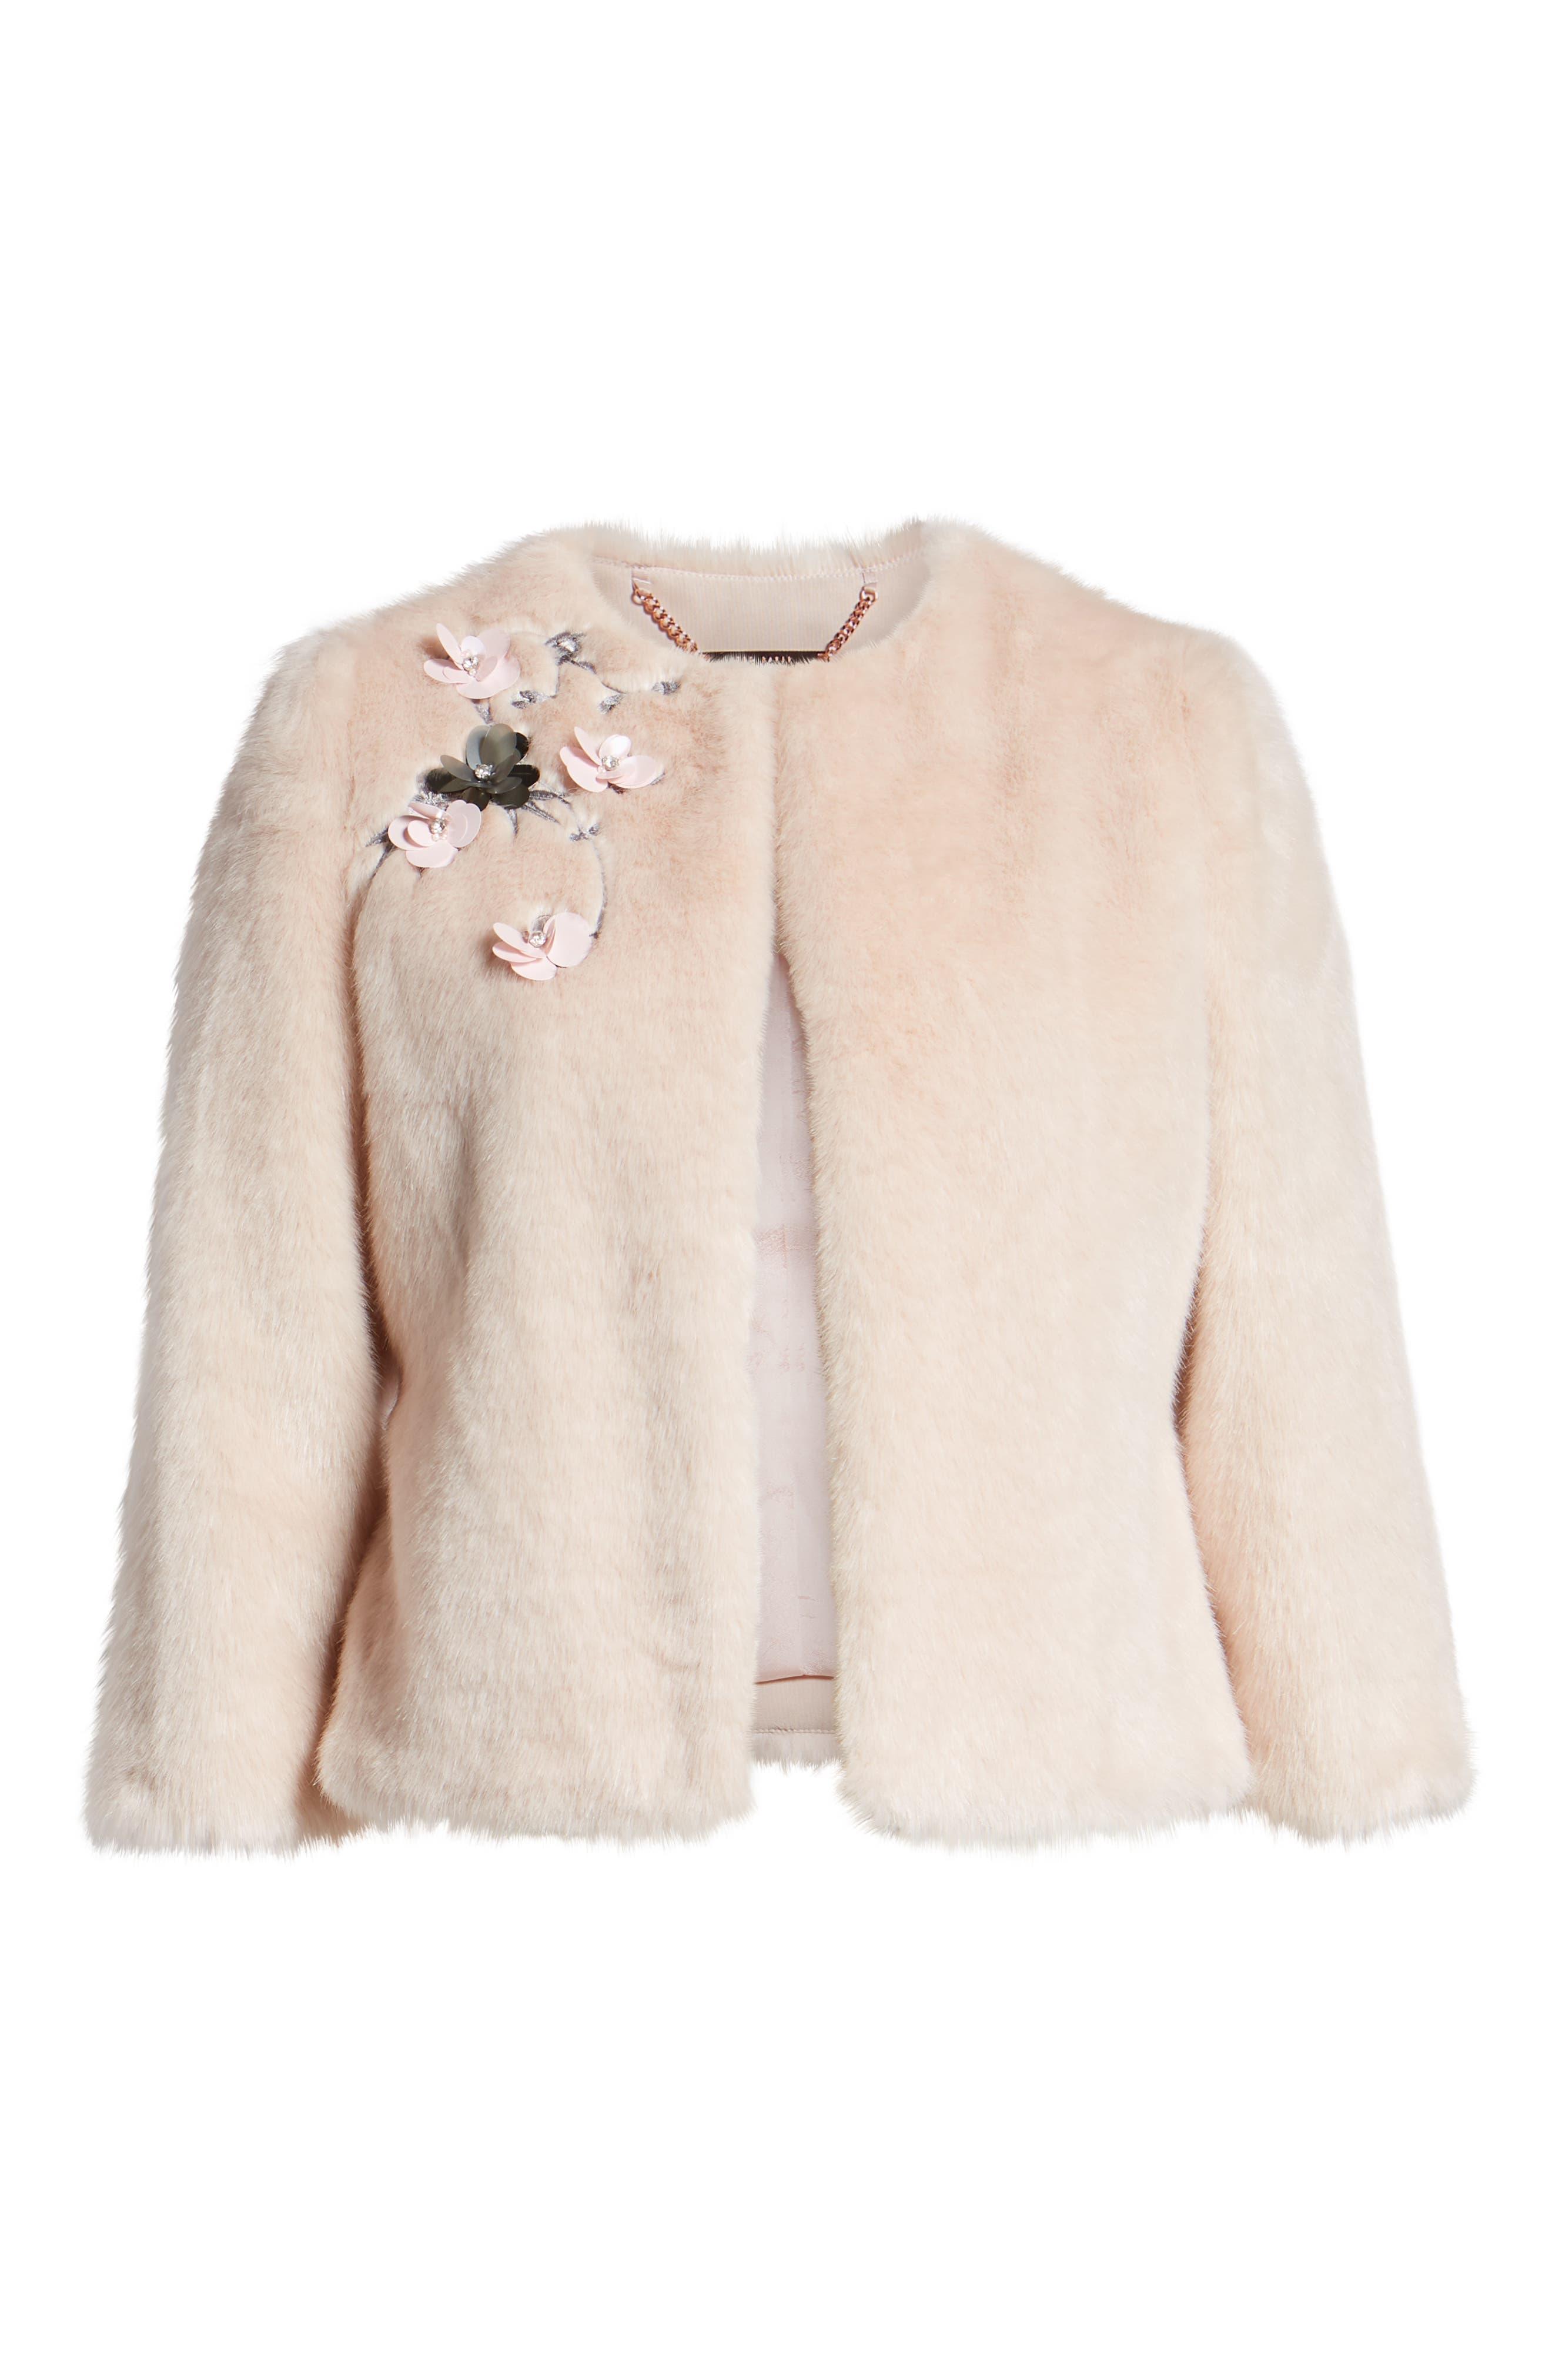 Appliqué Embellished Faux Fur Crop Jacket,                             Alternate thumbnail 6, color,                             NUDE PINK